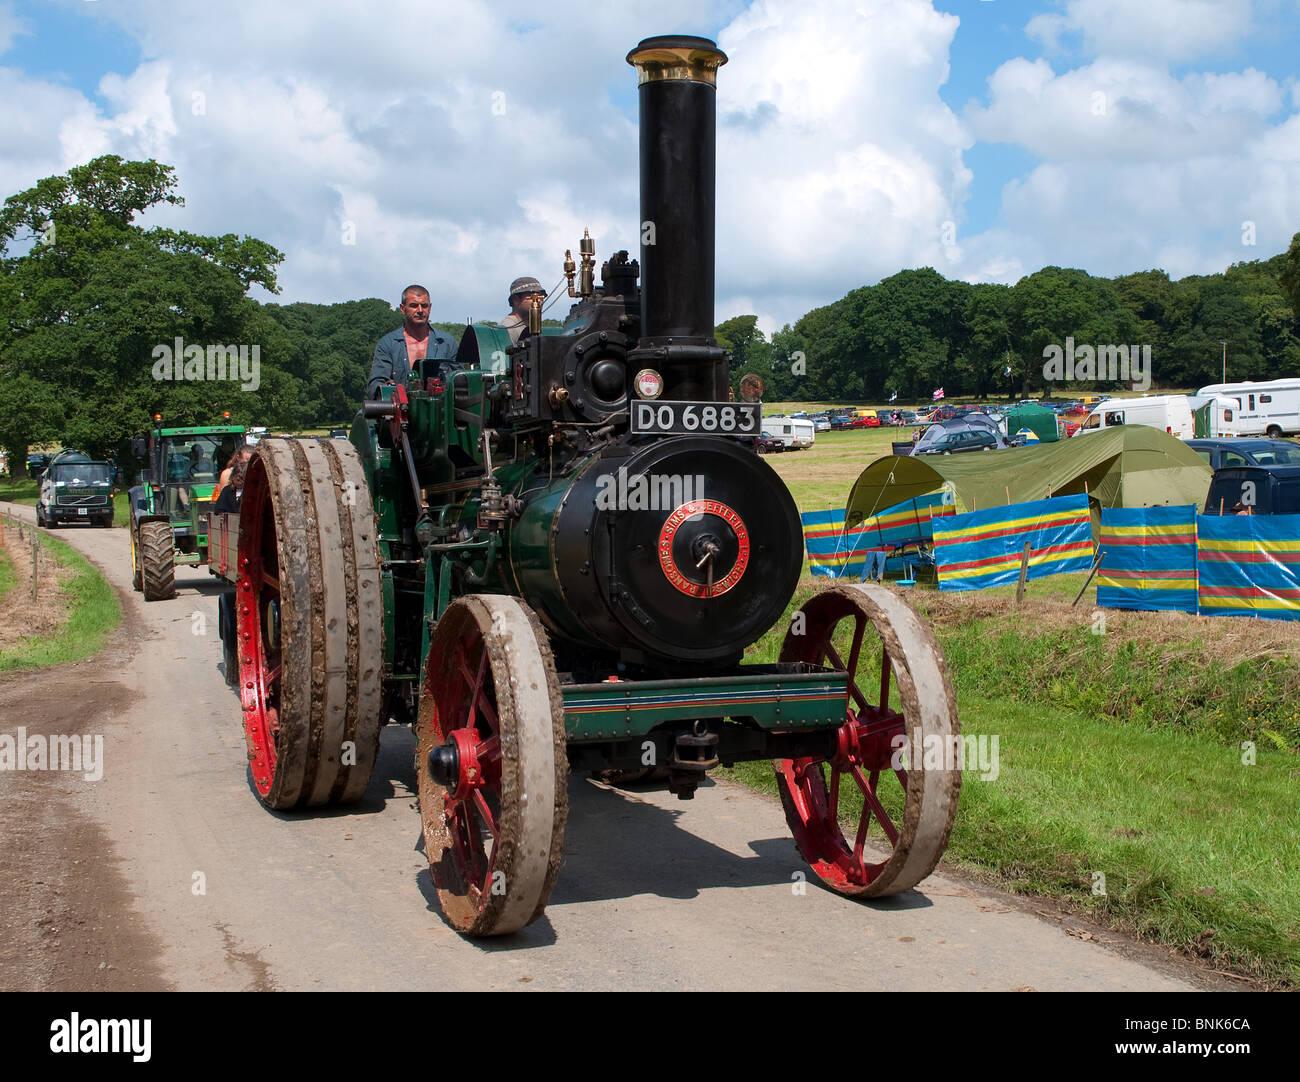 a traction engine at boconnoc steam rally, boconnoc house near liskeard in cornwall, uk - Stock Image